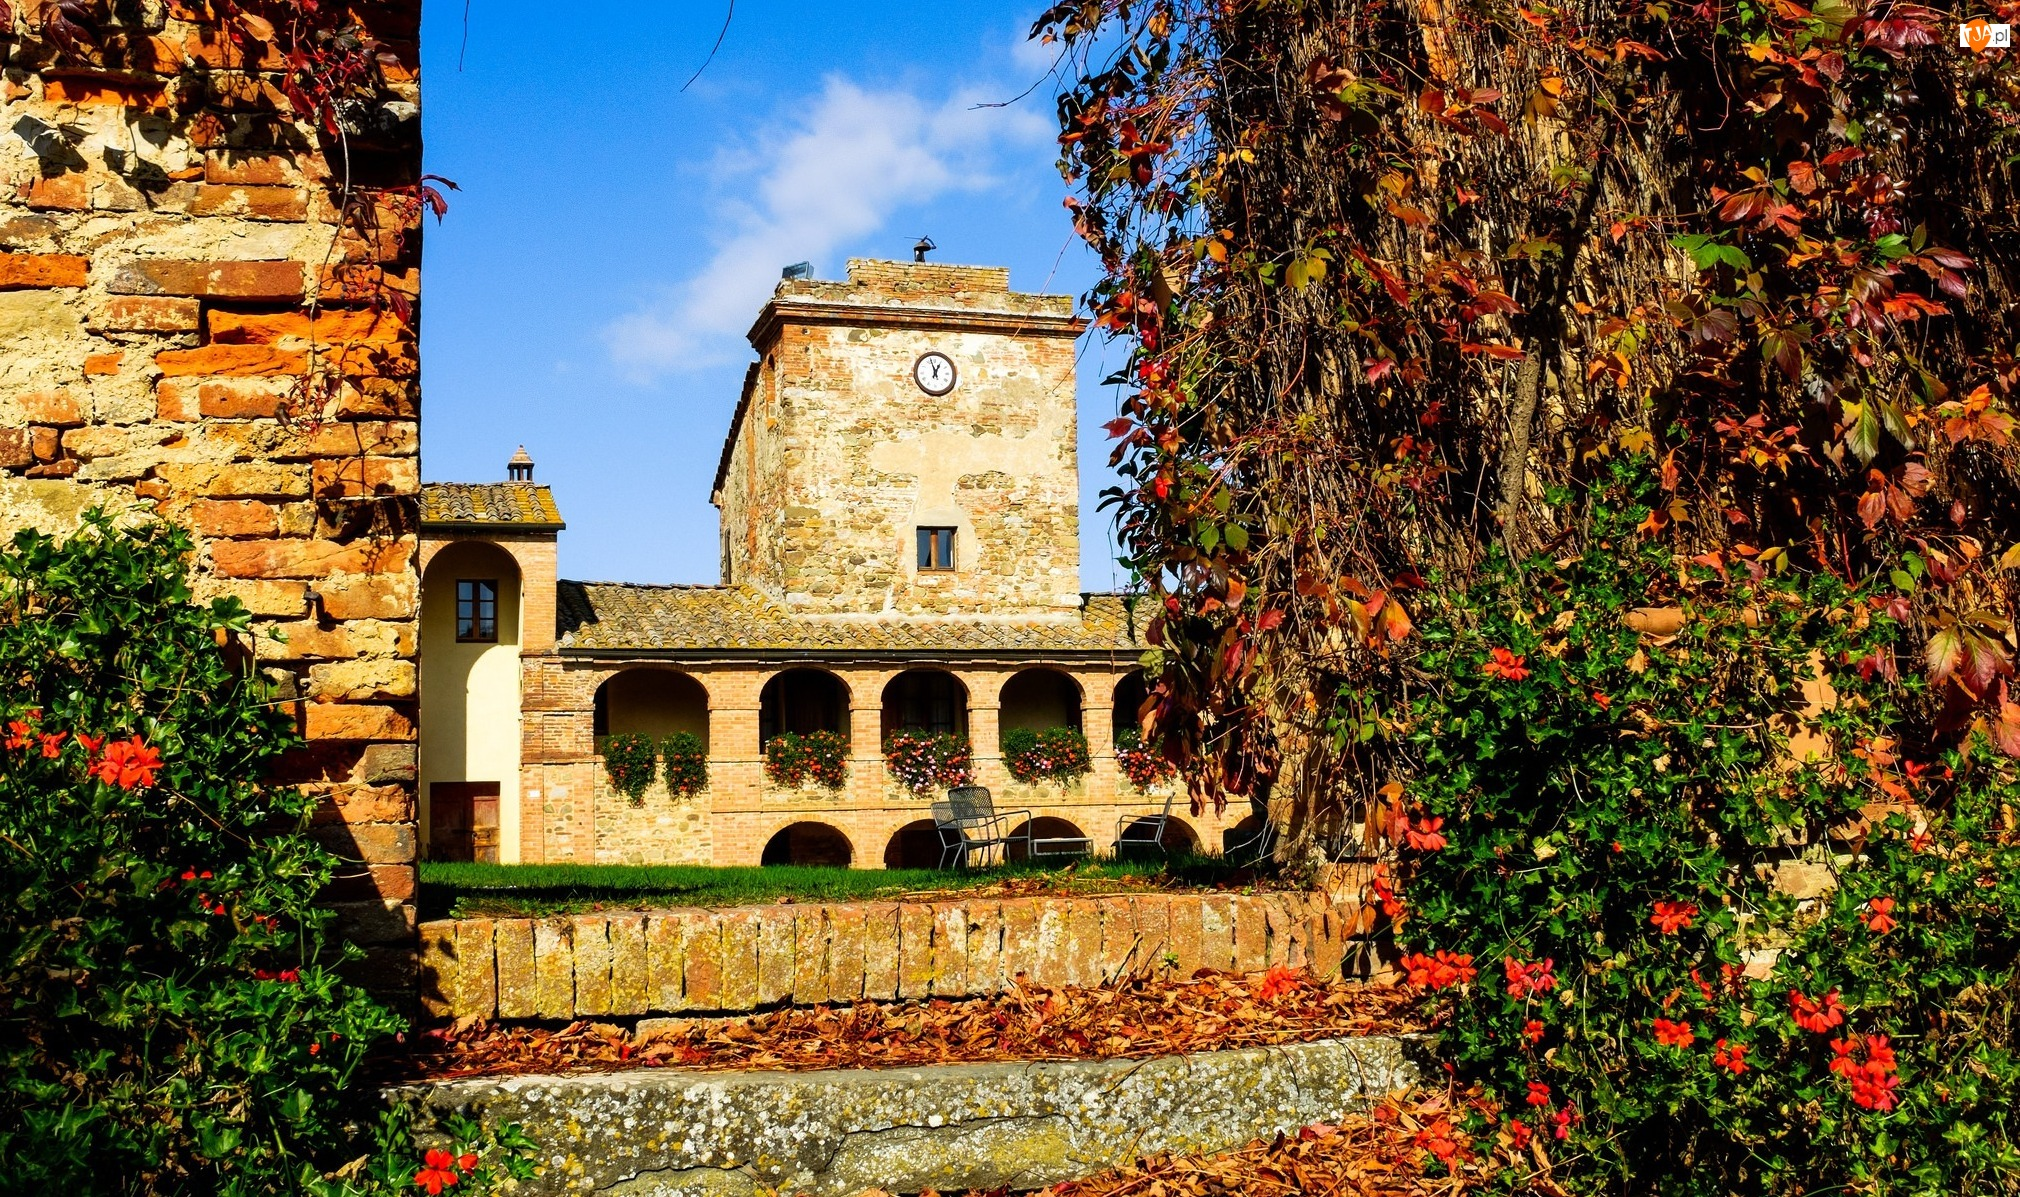 Drzewa, Włochy, Sinalunga, Toskania, Hotel Locanda dellAmorosa